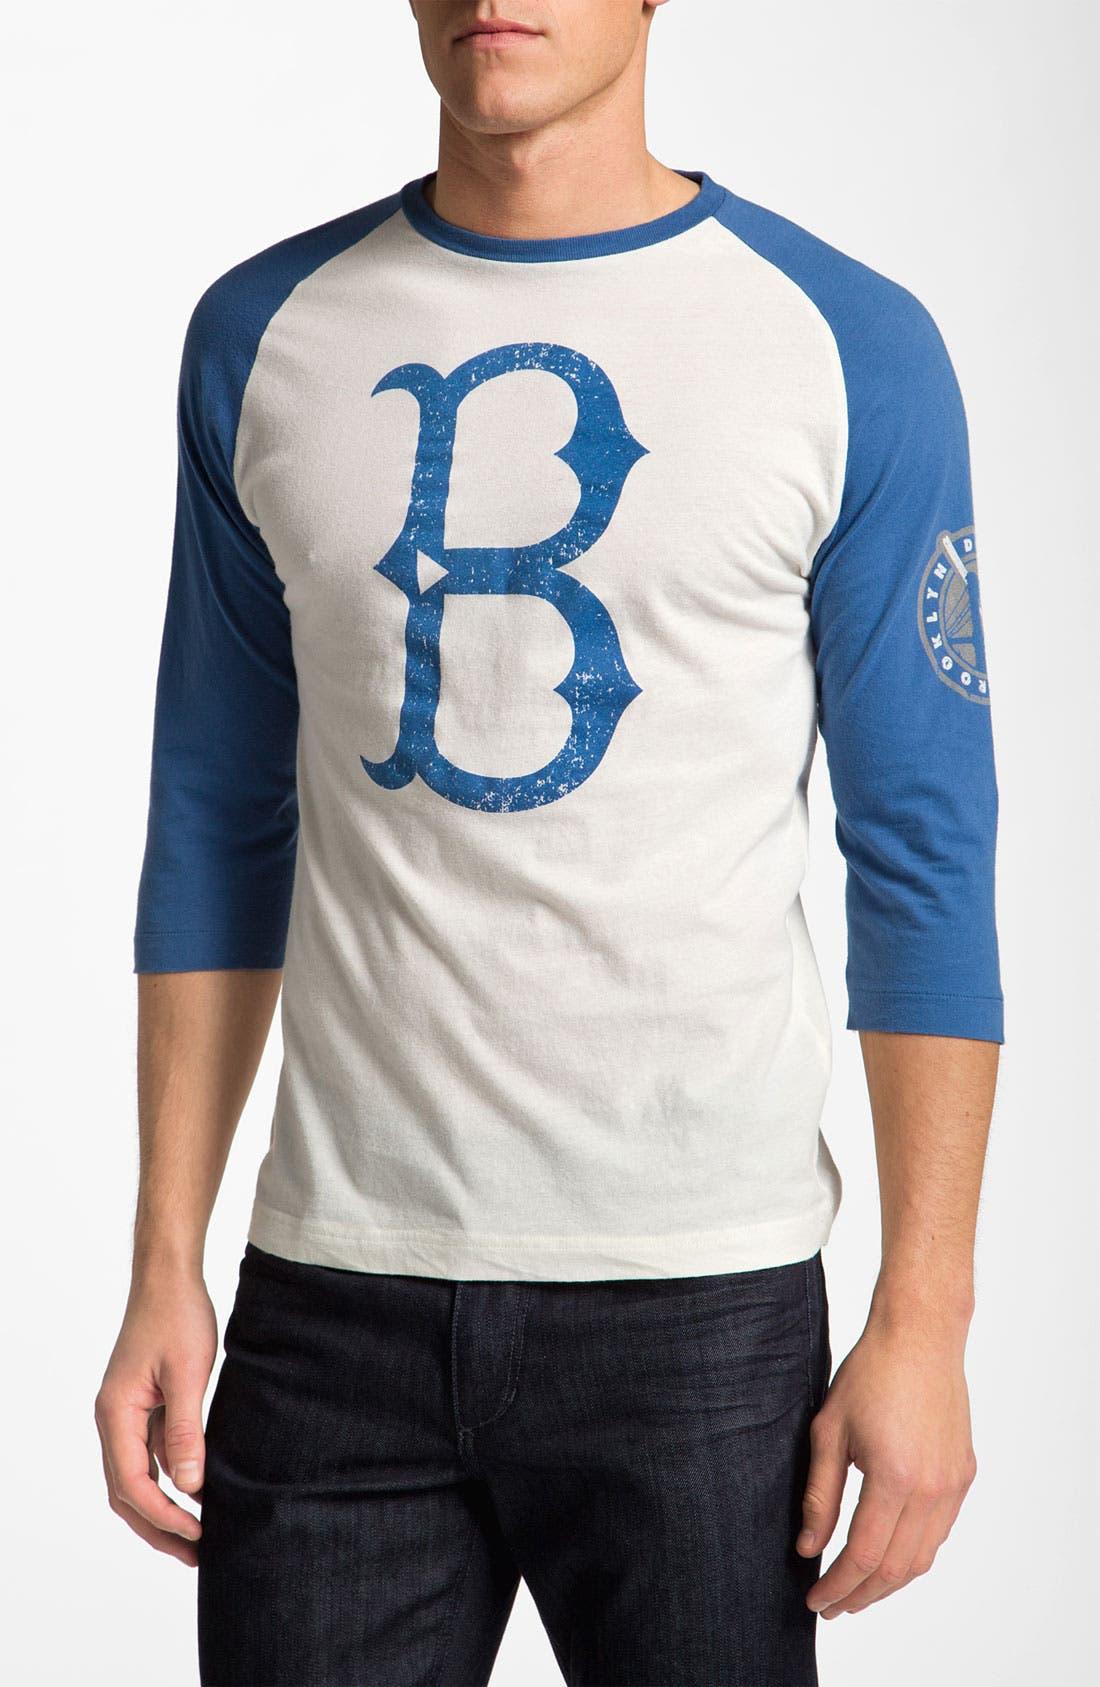 Main Image - Wright & Ditson 'Brooklyn Dodgers' Baseball T-Shirt